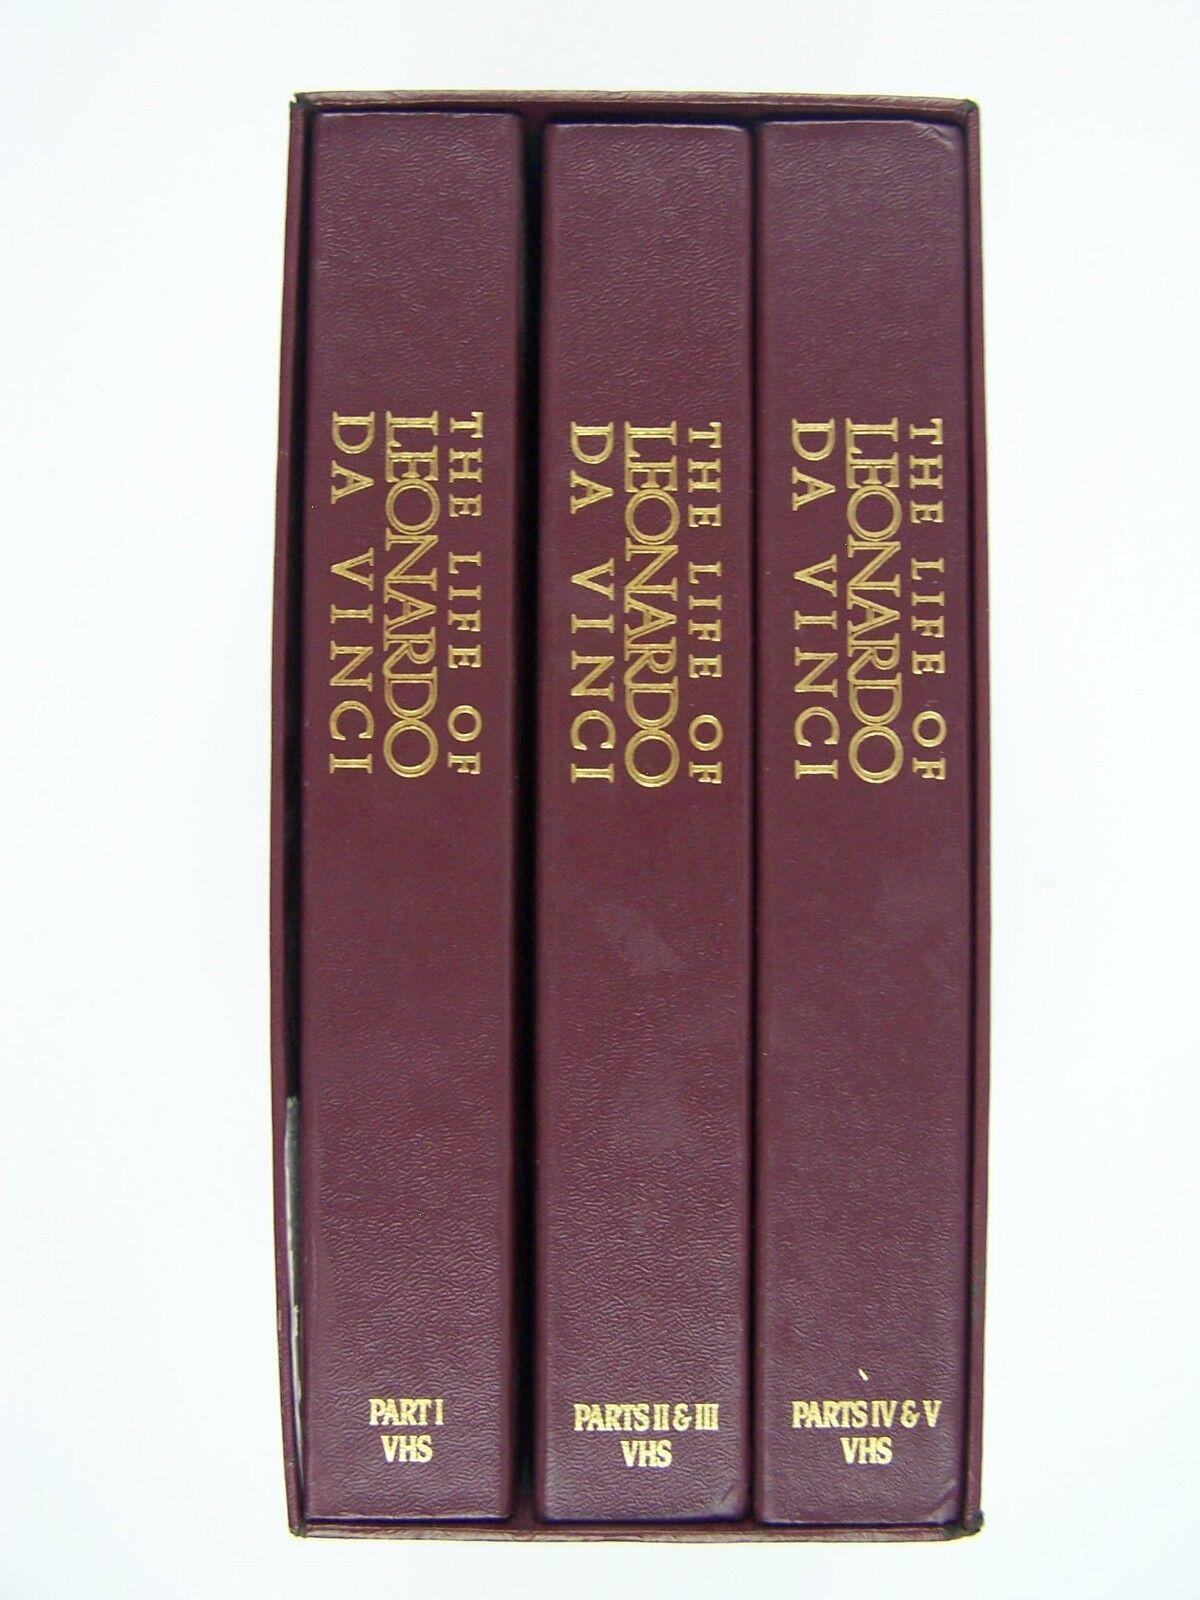 The Life of Leonardo Da Vinci 3 Tape VHS Box Set 339370